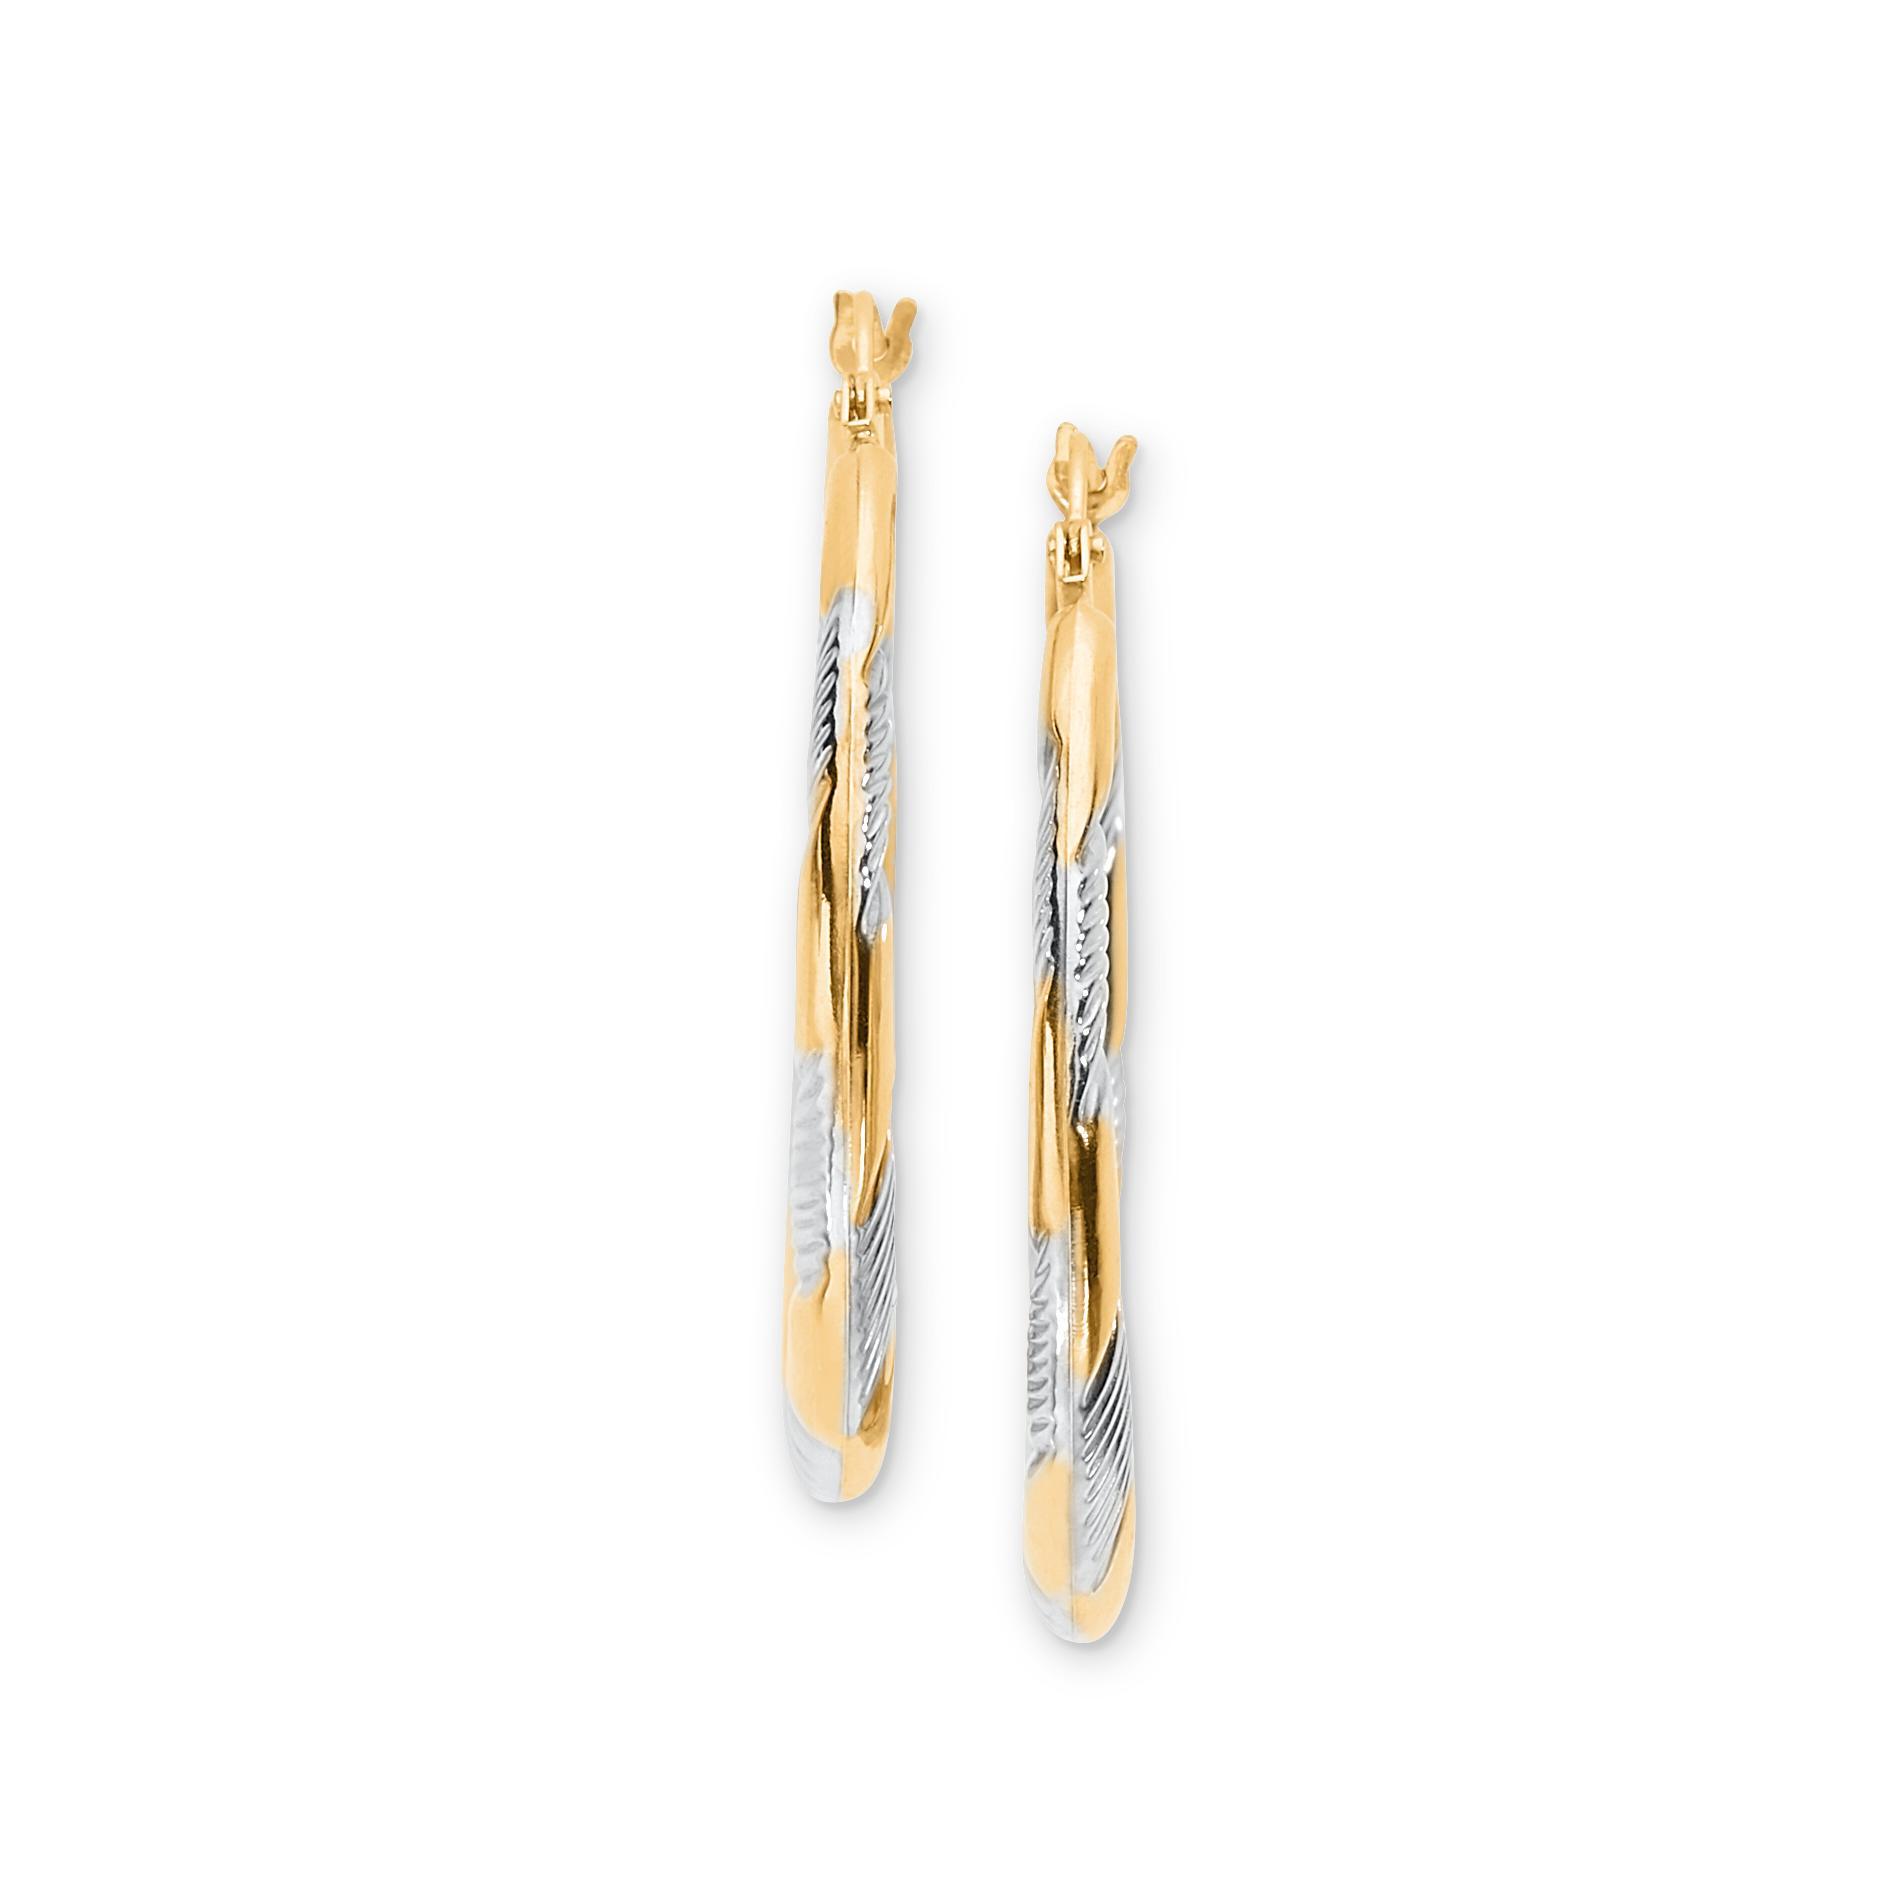 10K Gold Two-Tone Textured Swirl Hoop Earrings